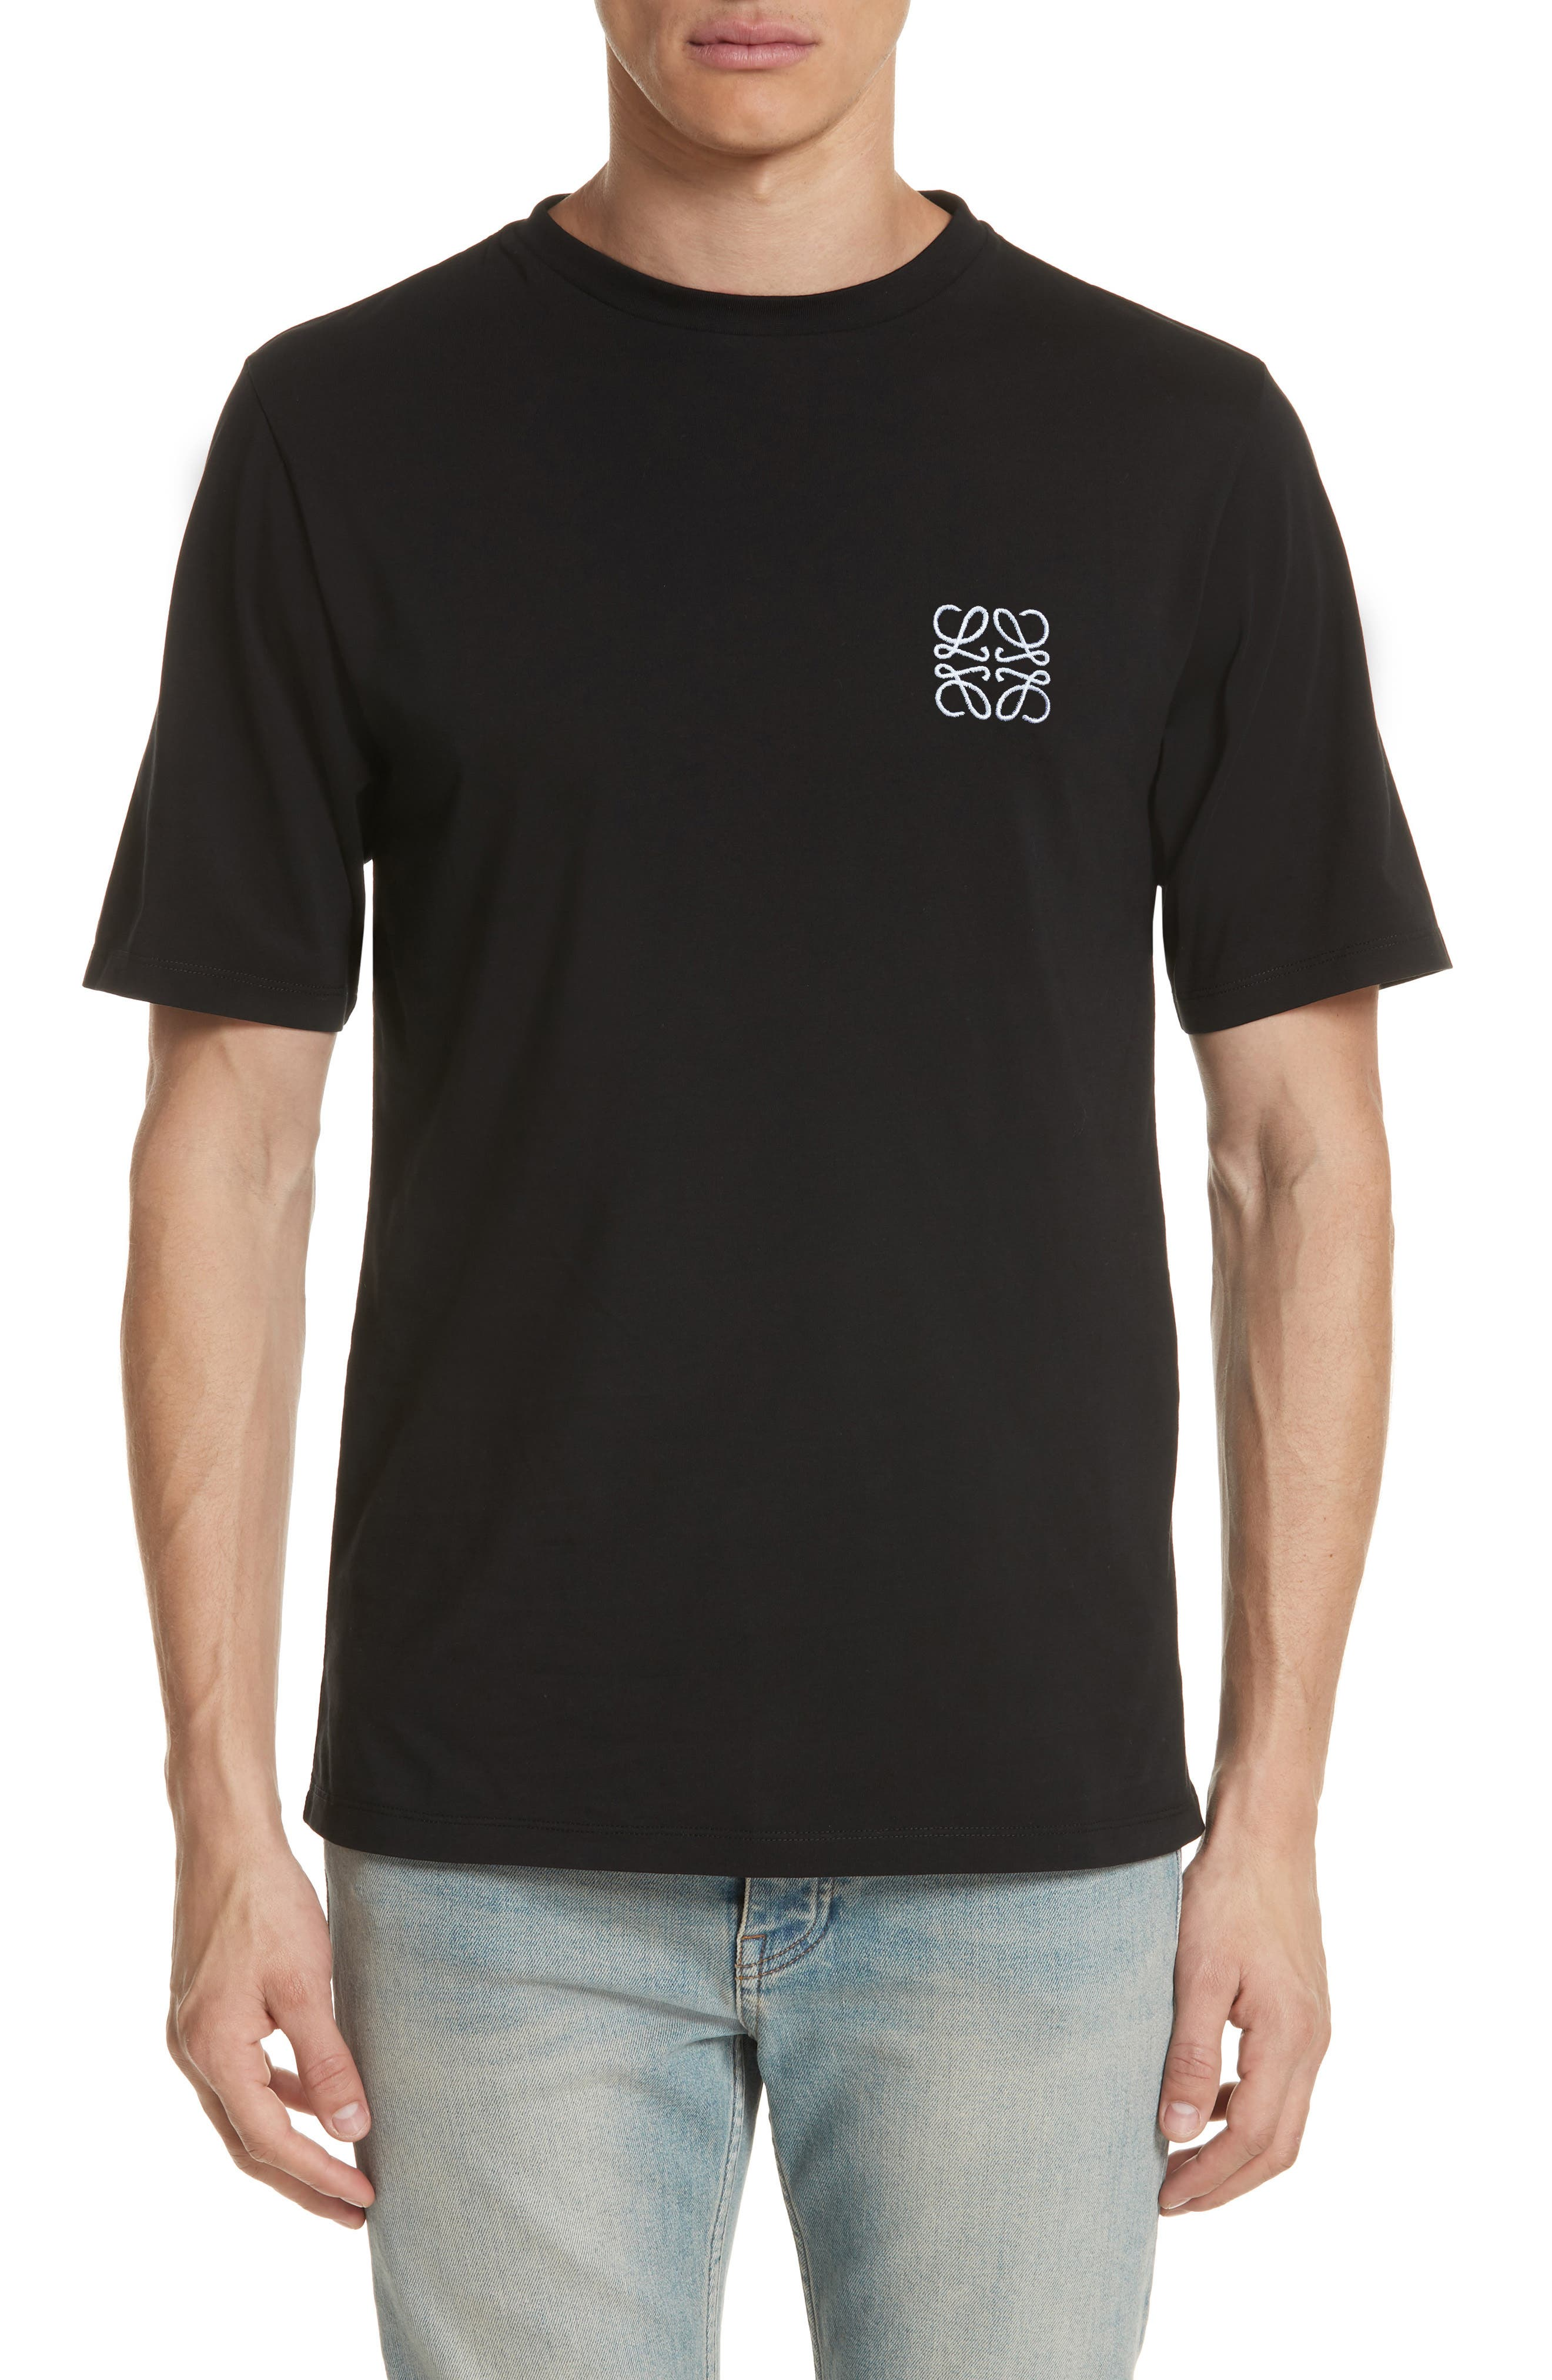 LOEWE, Anagram Logo T-Shirt, Main thumbnail 1, color, BLACK